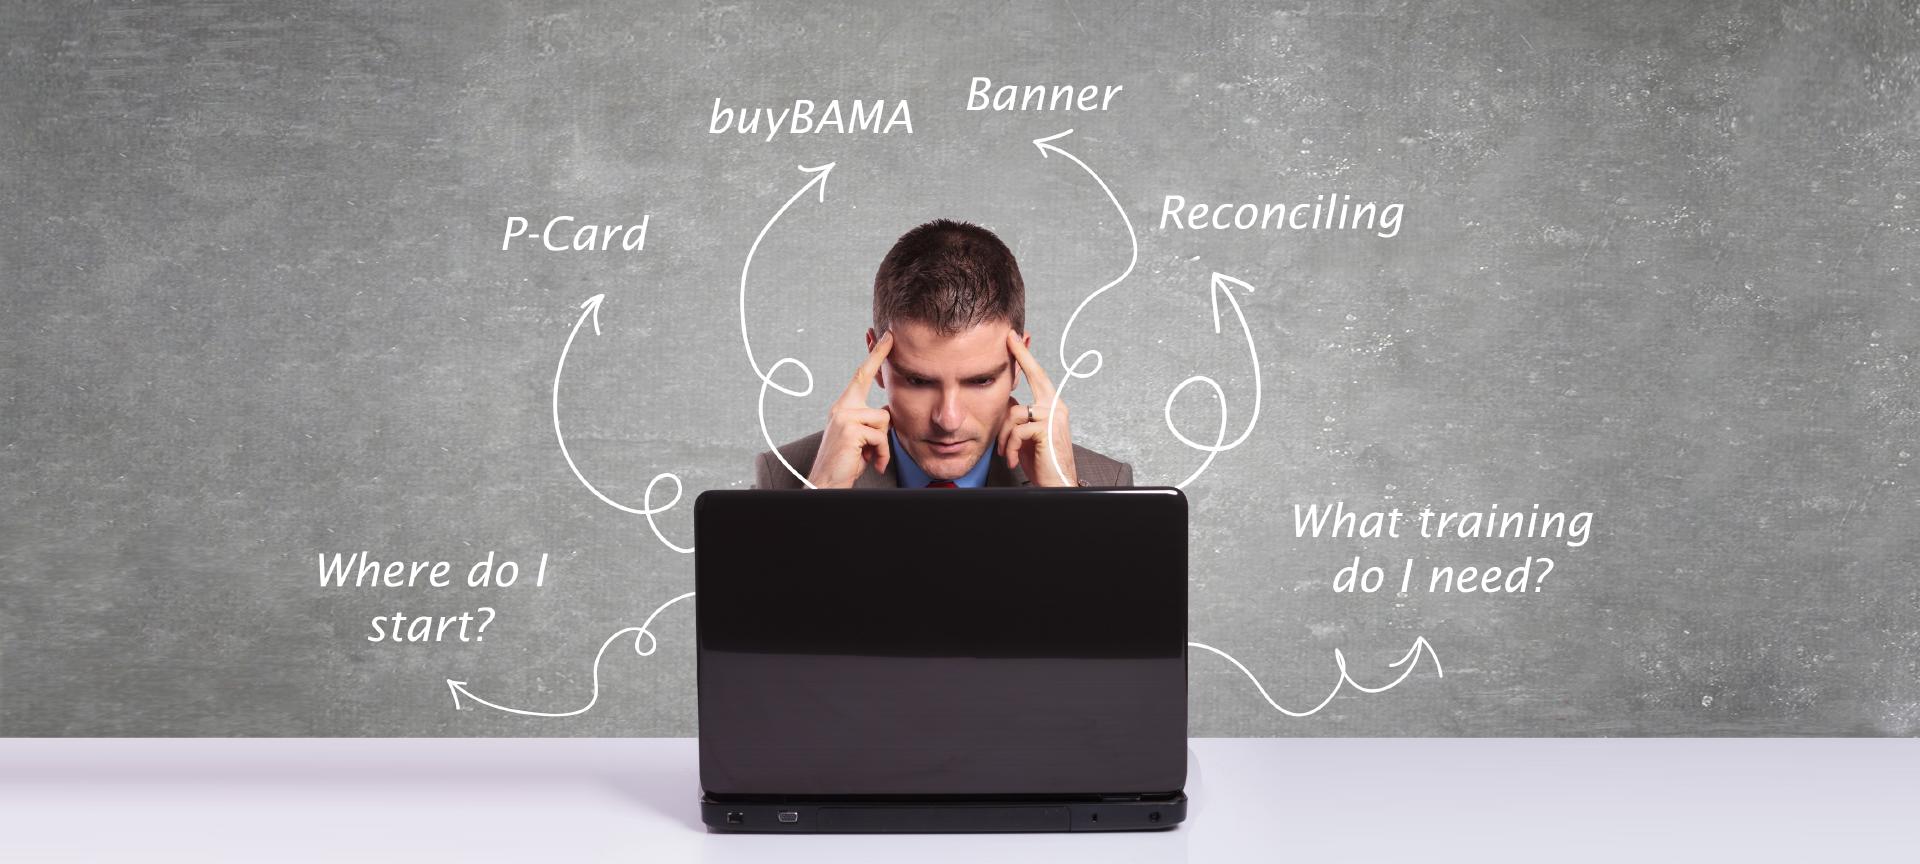 P-Card, Banner, buyBAMA: Where do I start?